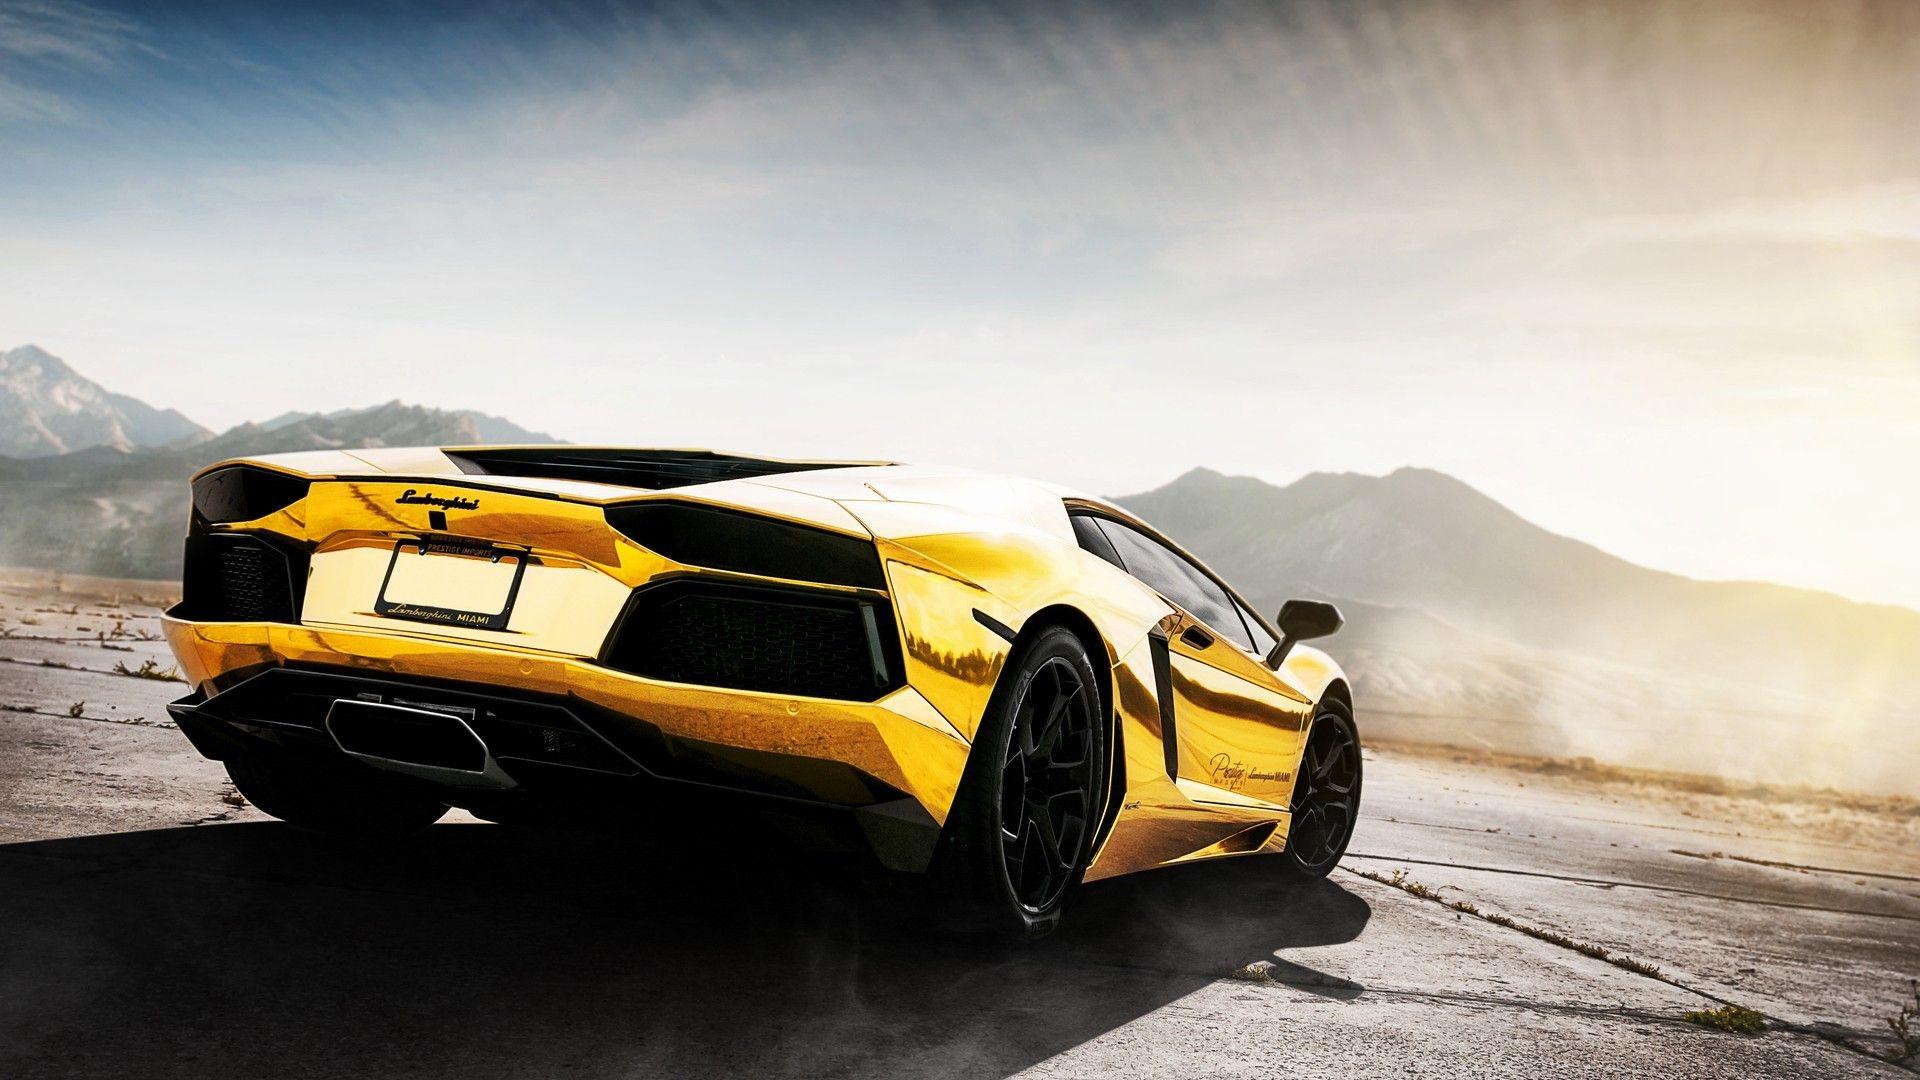 Gold Yellow Cars Landscape Rims Lamborghini Vehicle Golden Car Aventador Stance Wallpaper